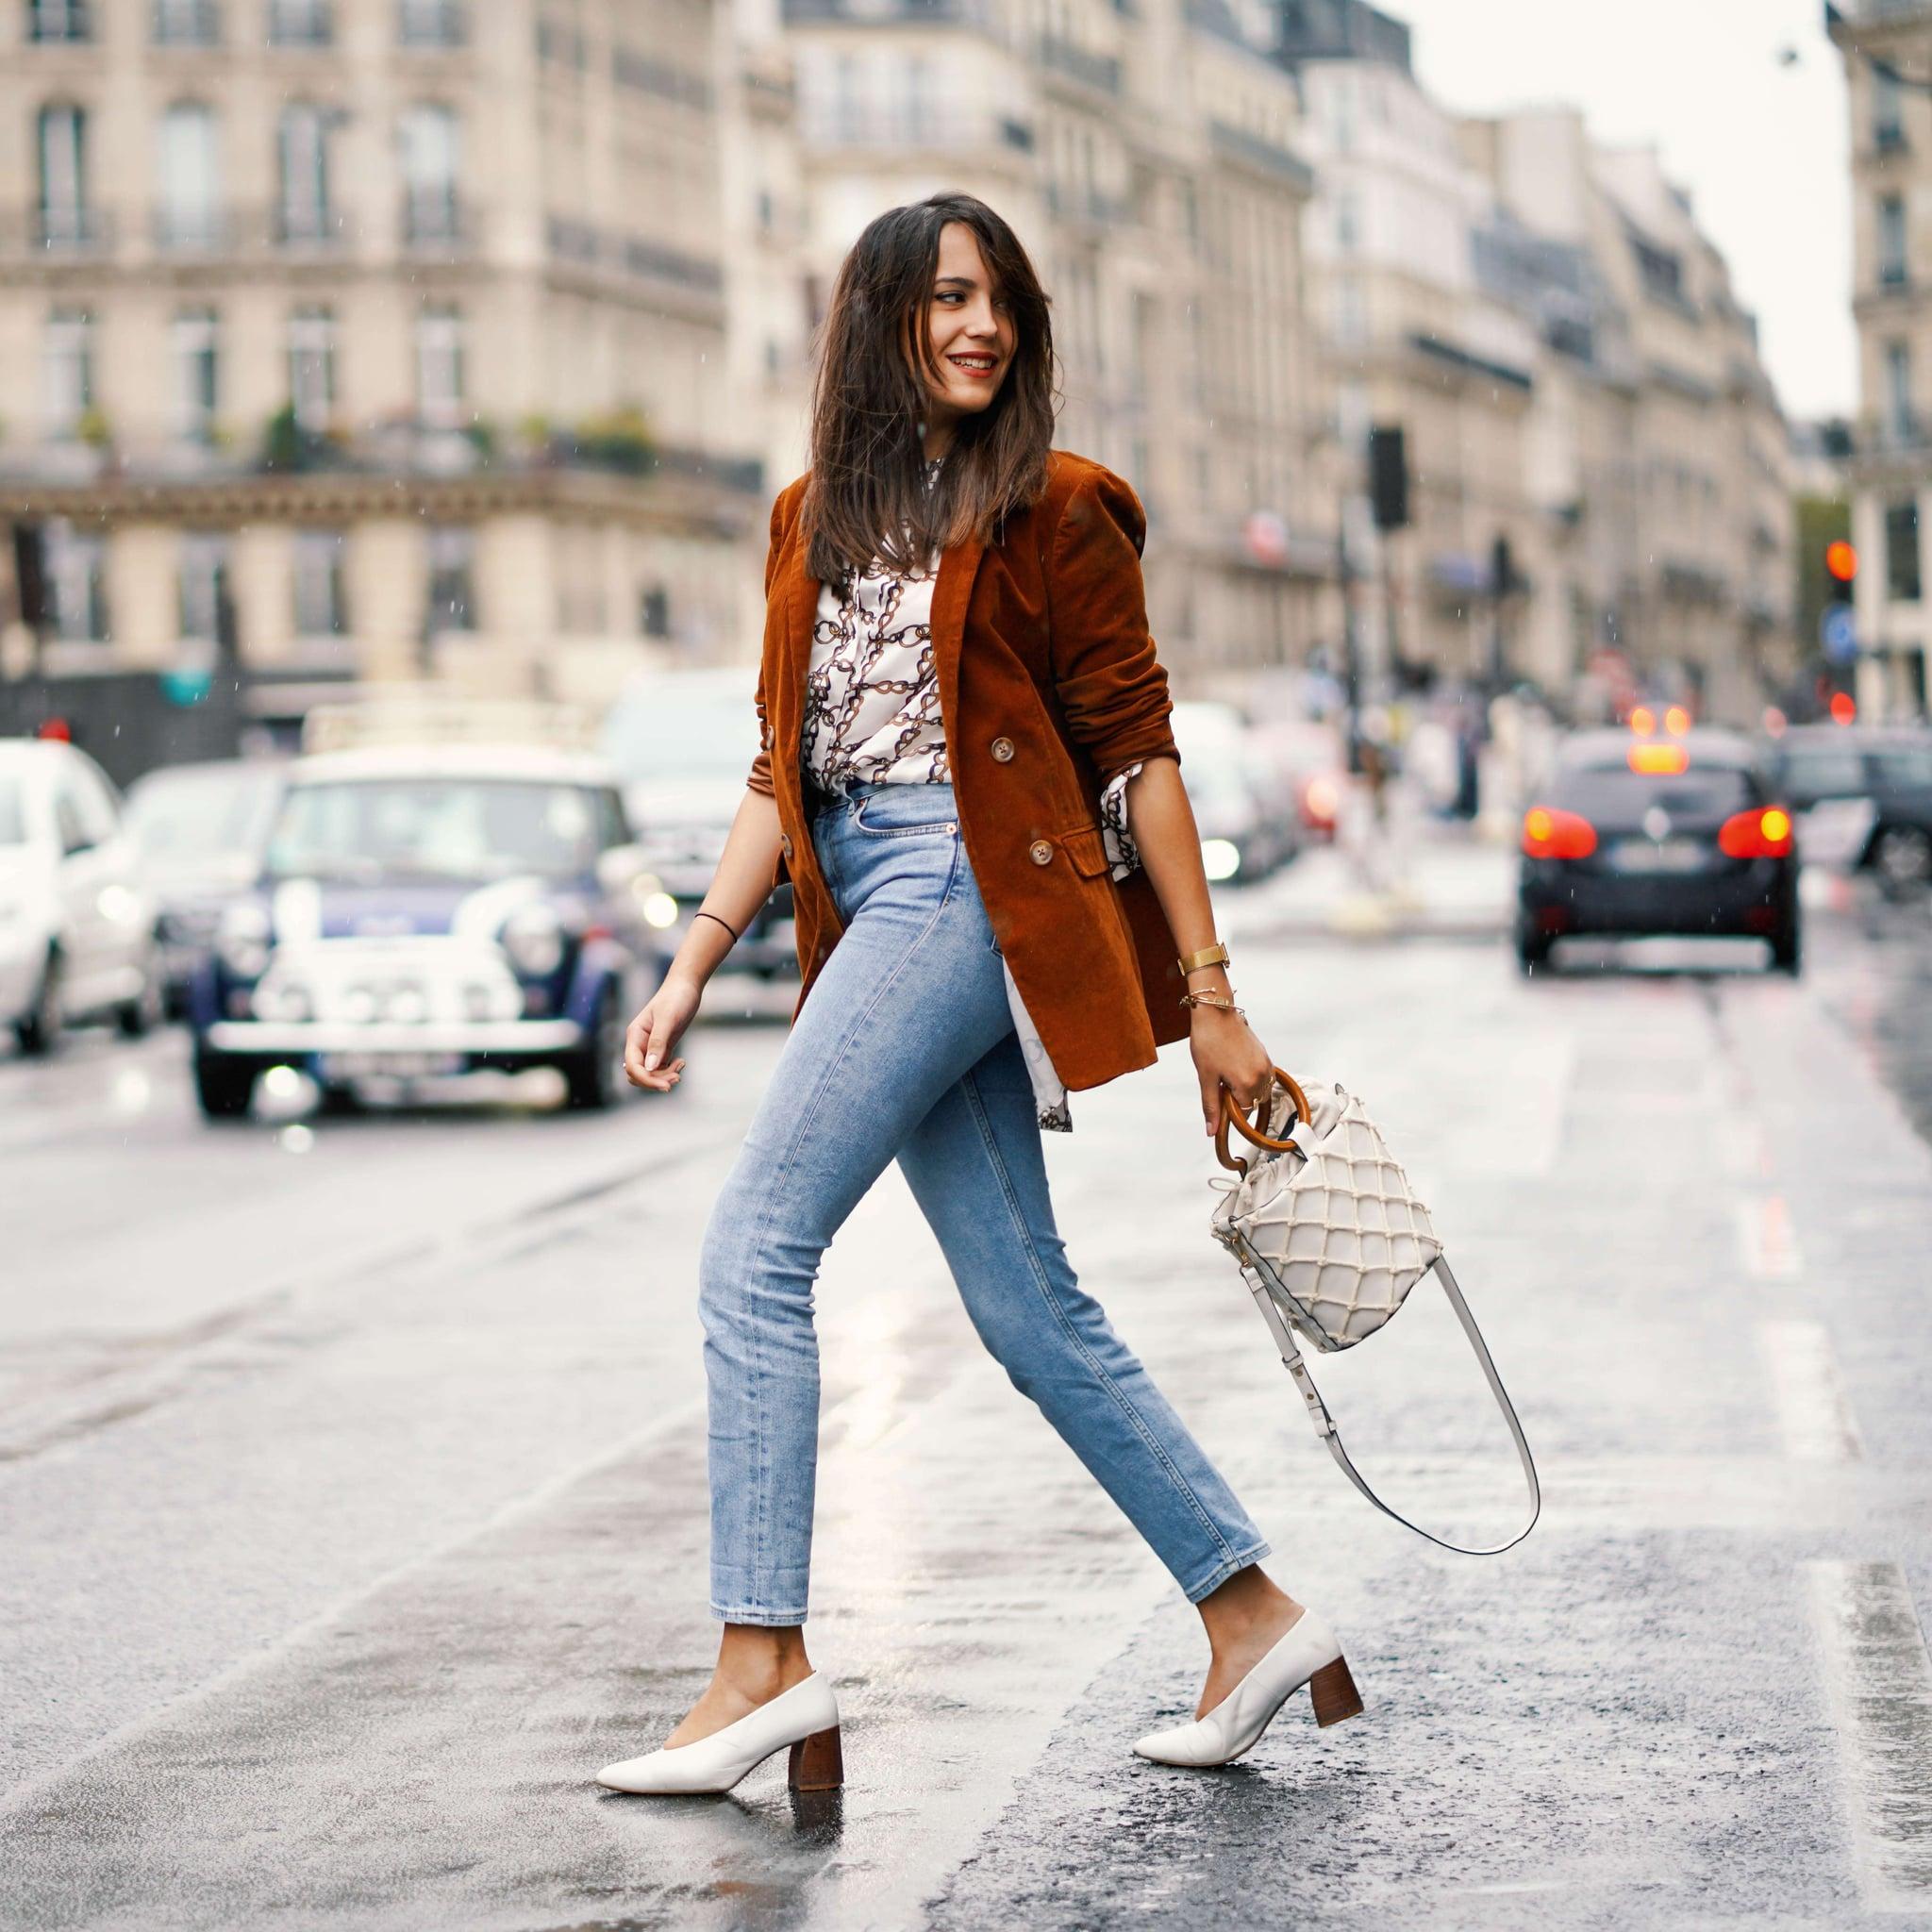 d81b67c794e Best Jeans For Women 2019